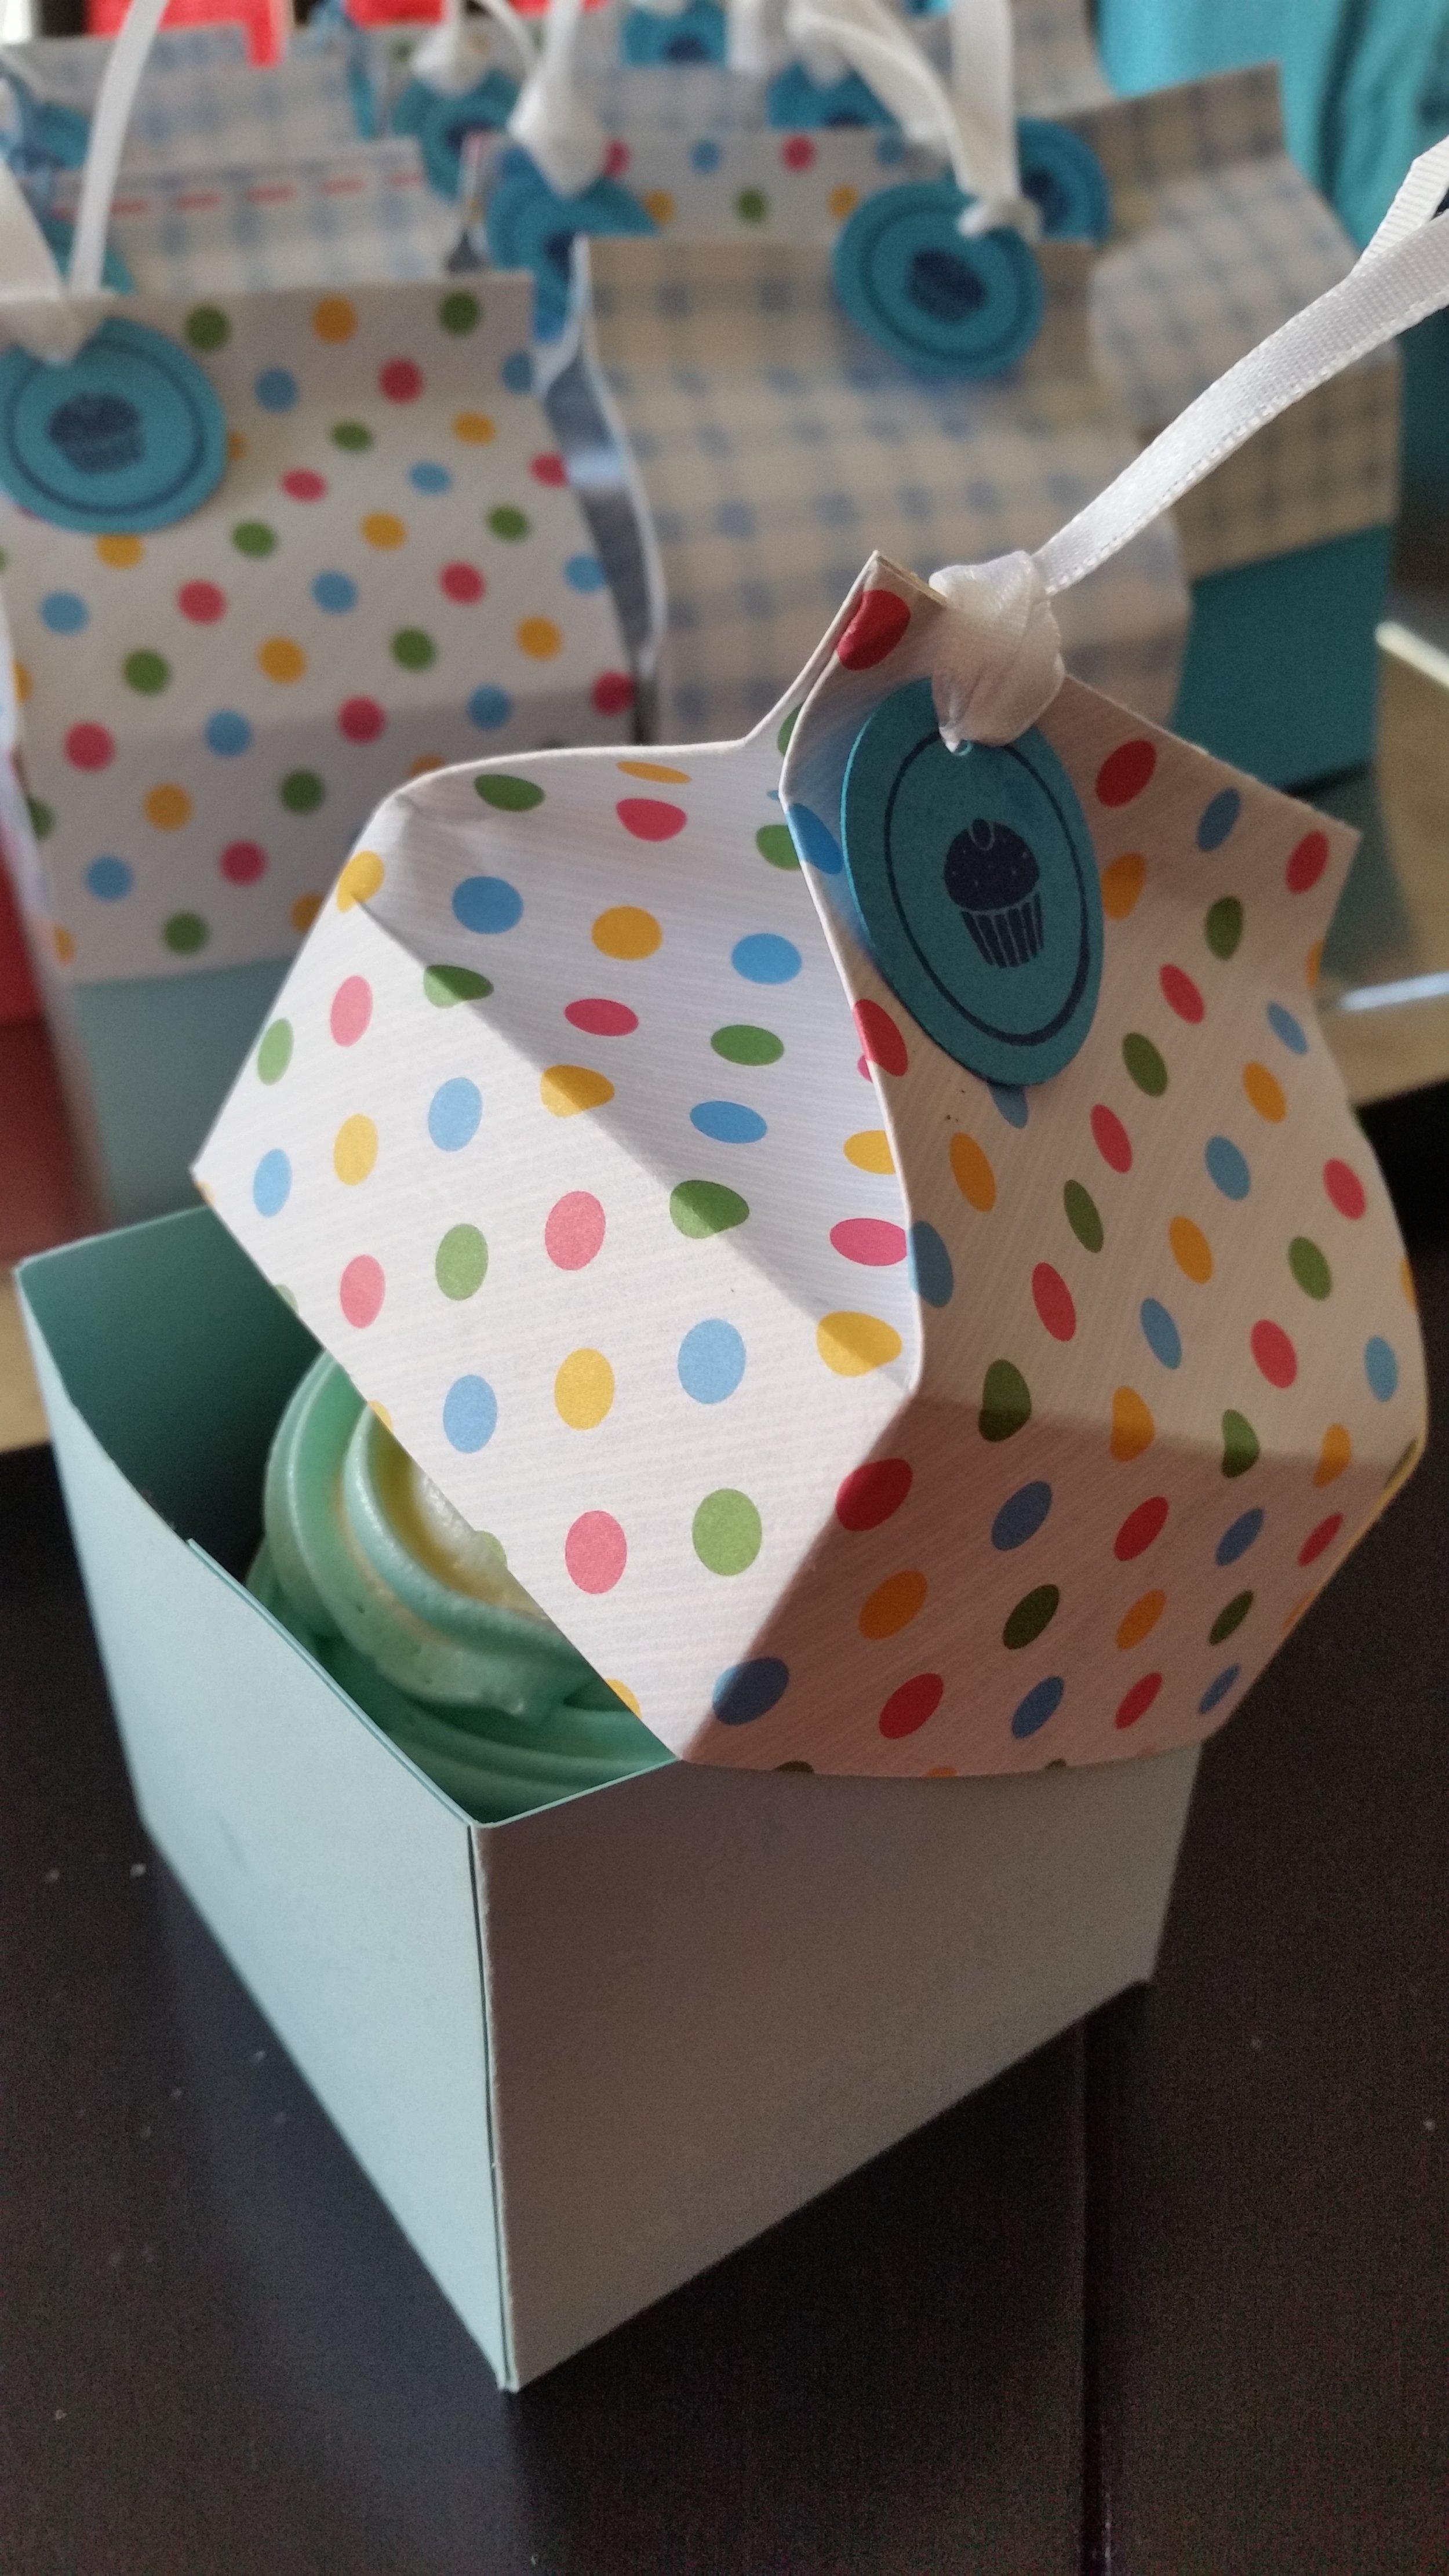 Lidded milk carton for cupcakes